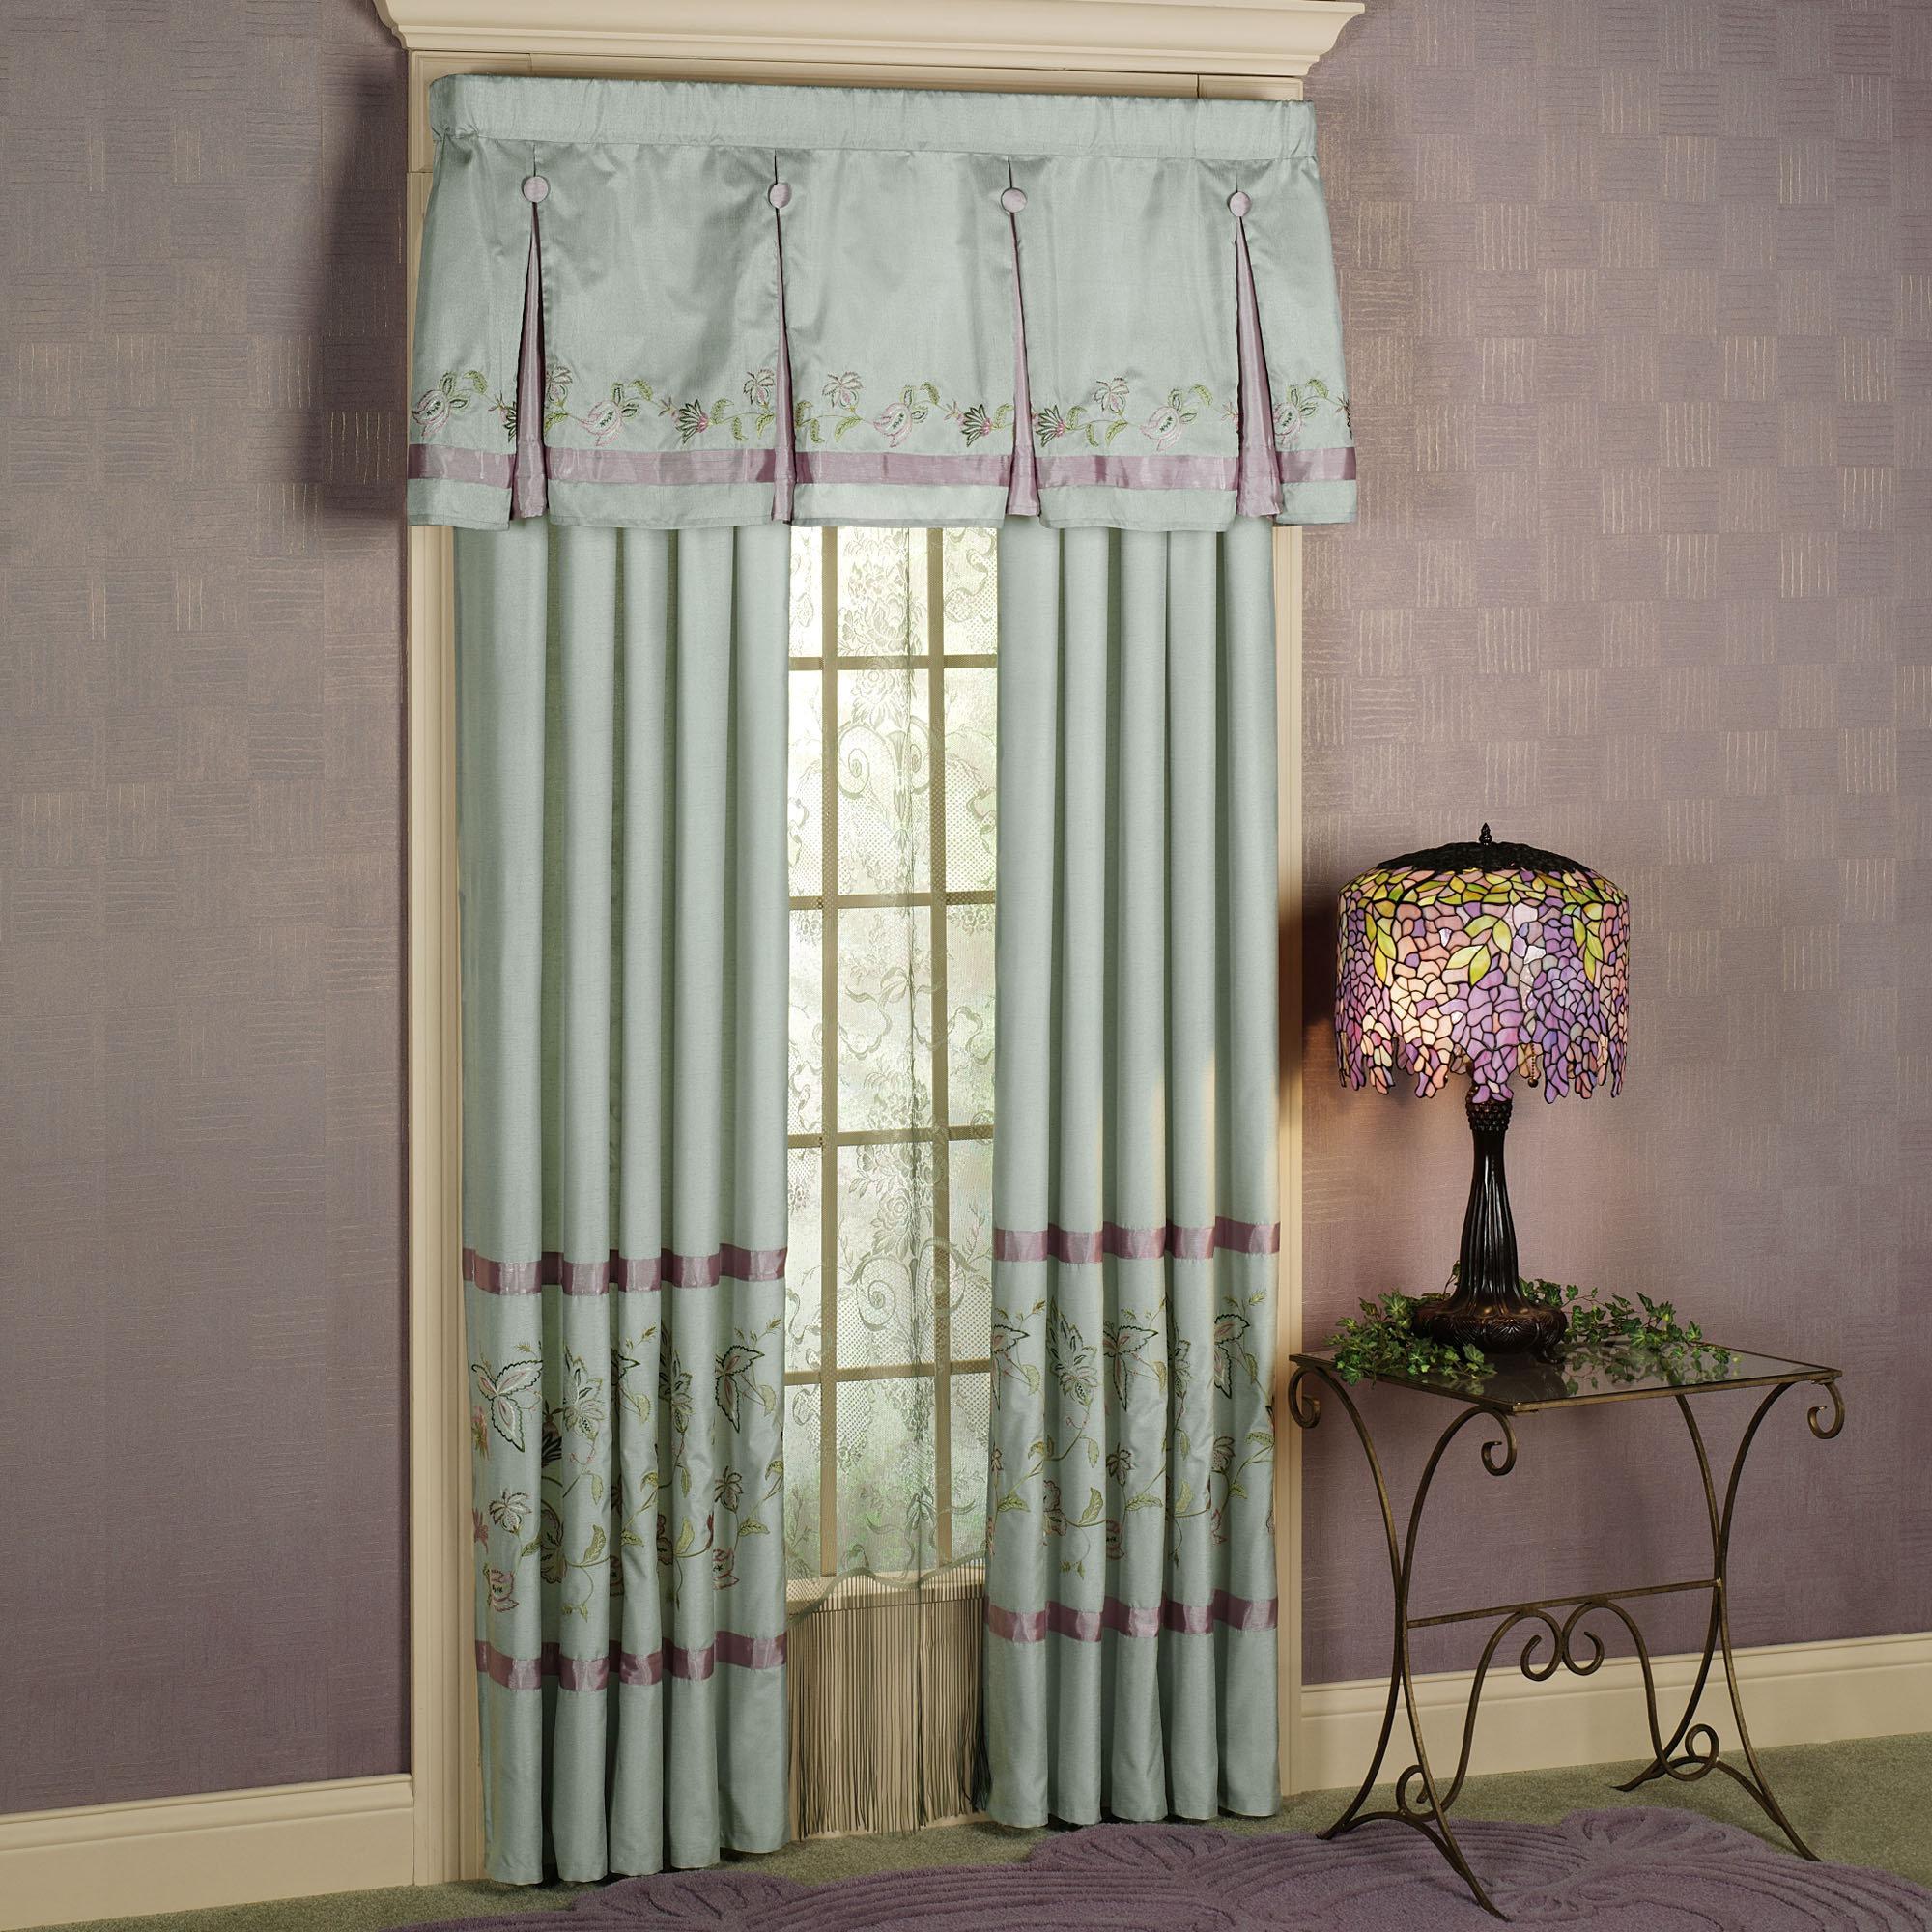 Jcpenney Curtains For Living Room Jcpenney Bedroom Curtains Partner Kontaktanzeigencom